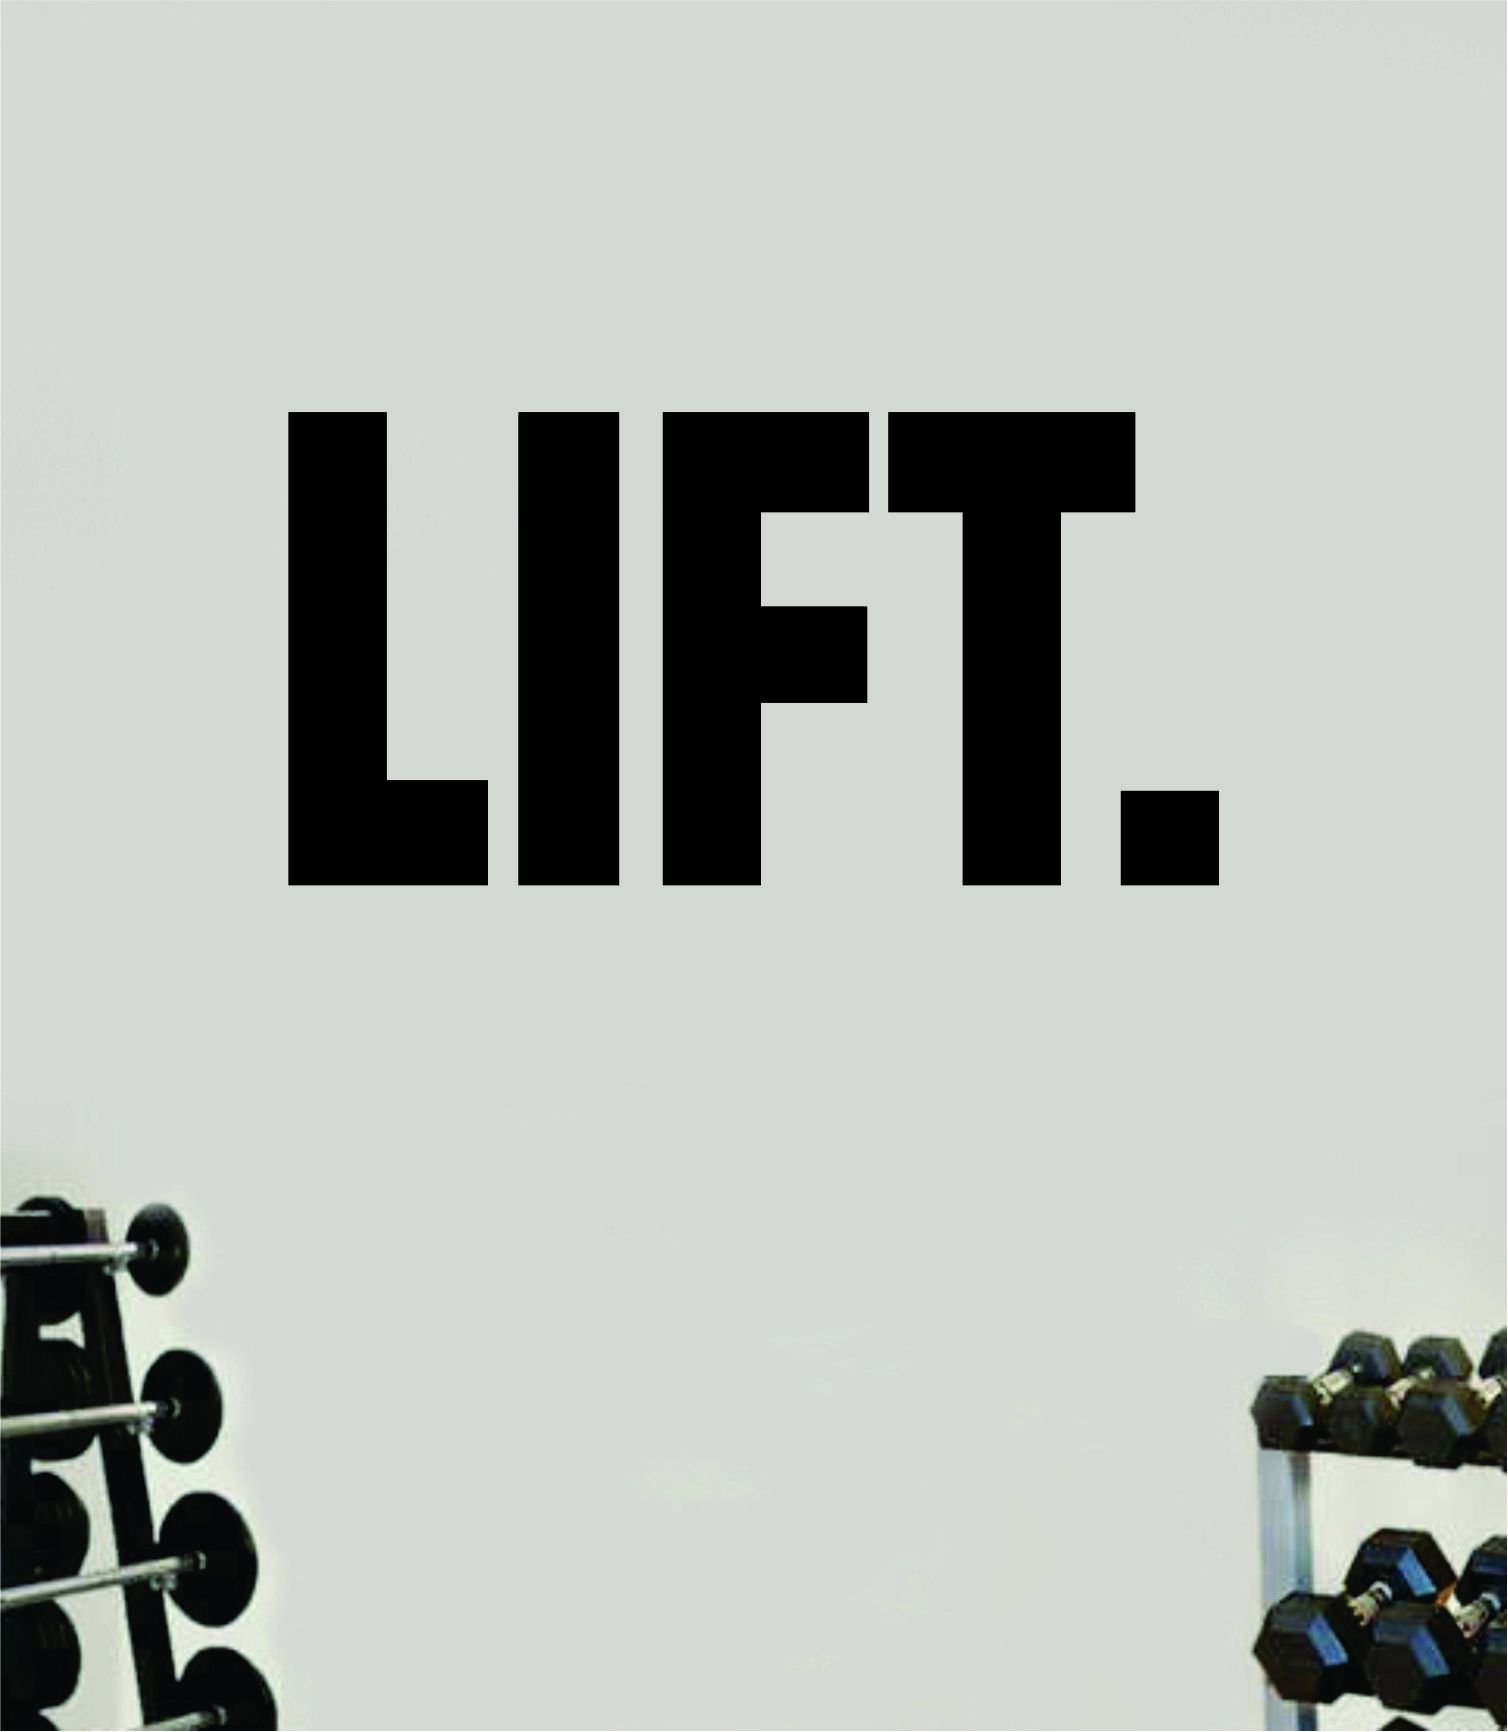 Lift Decal Sticker Wall Vinyl Art Wall Bedroom Room Home Decor Inspirational Motivational Teen Sports Gym Fitness - vivid blue